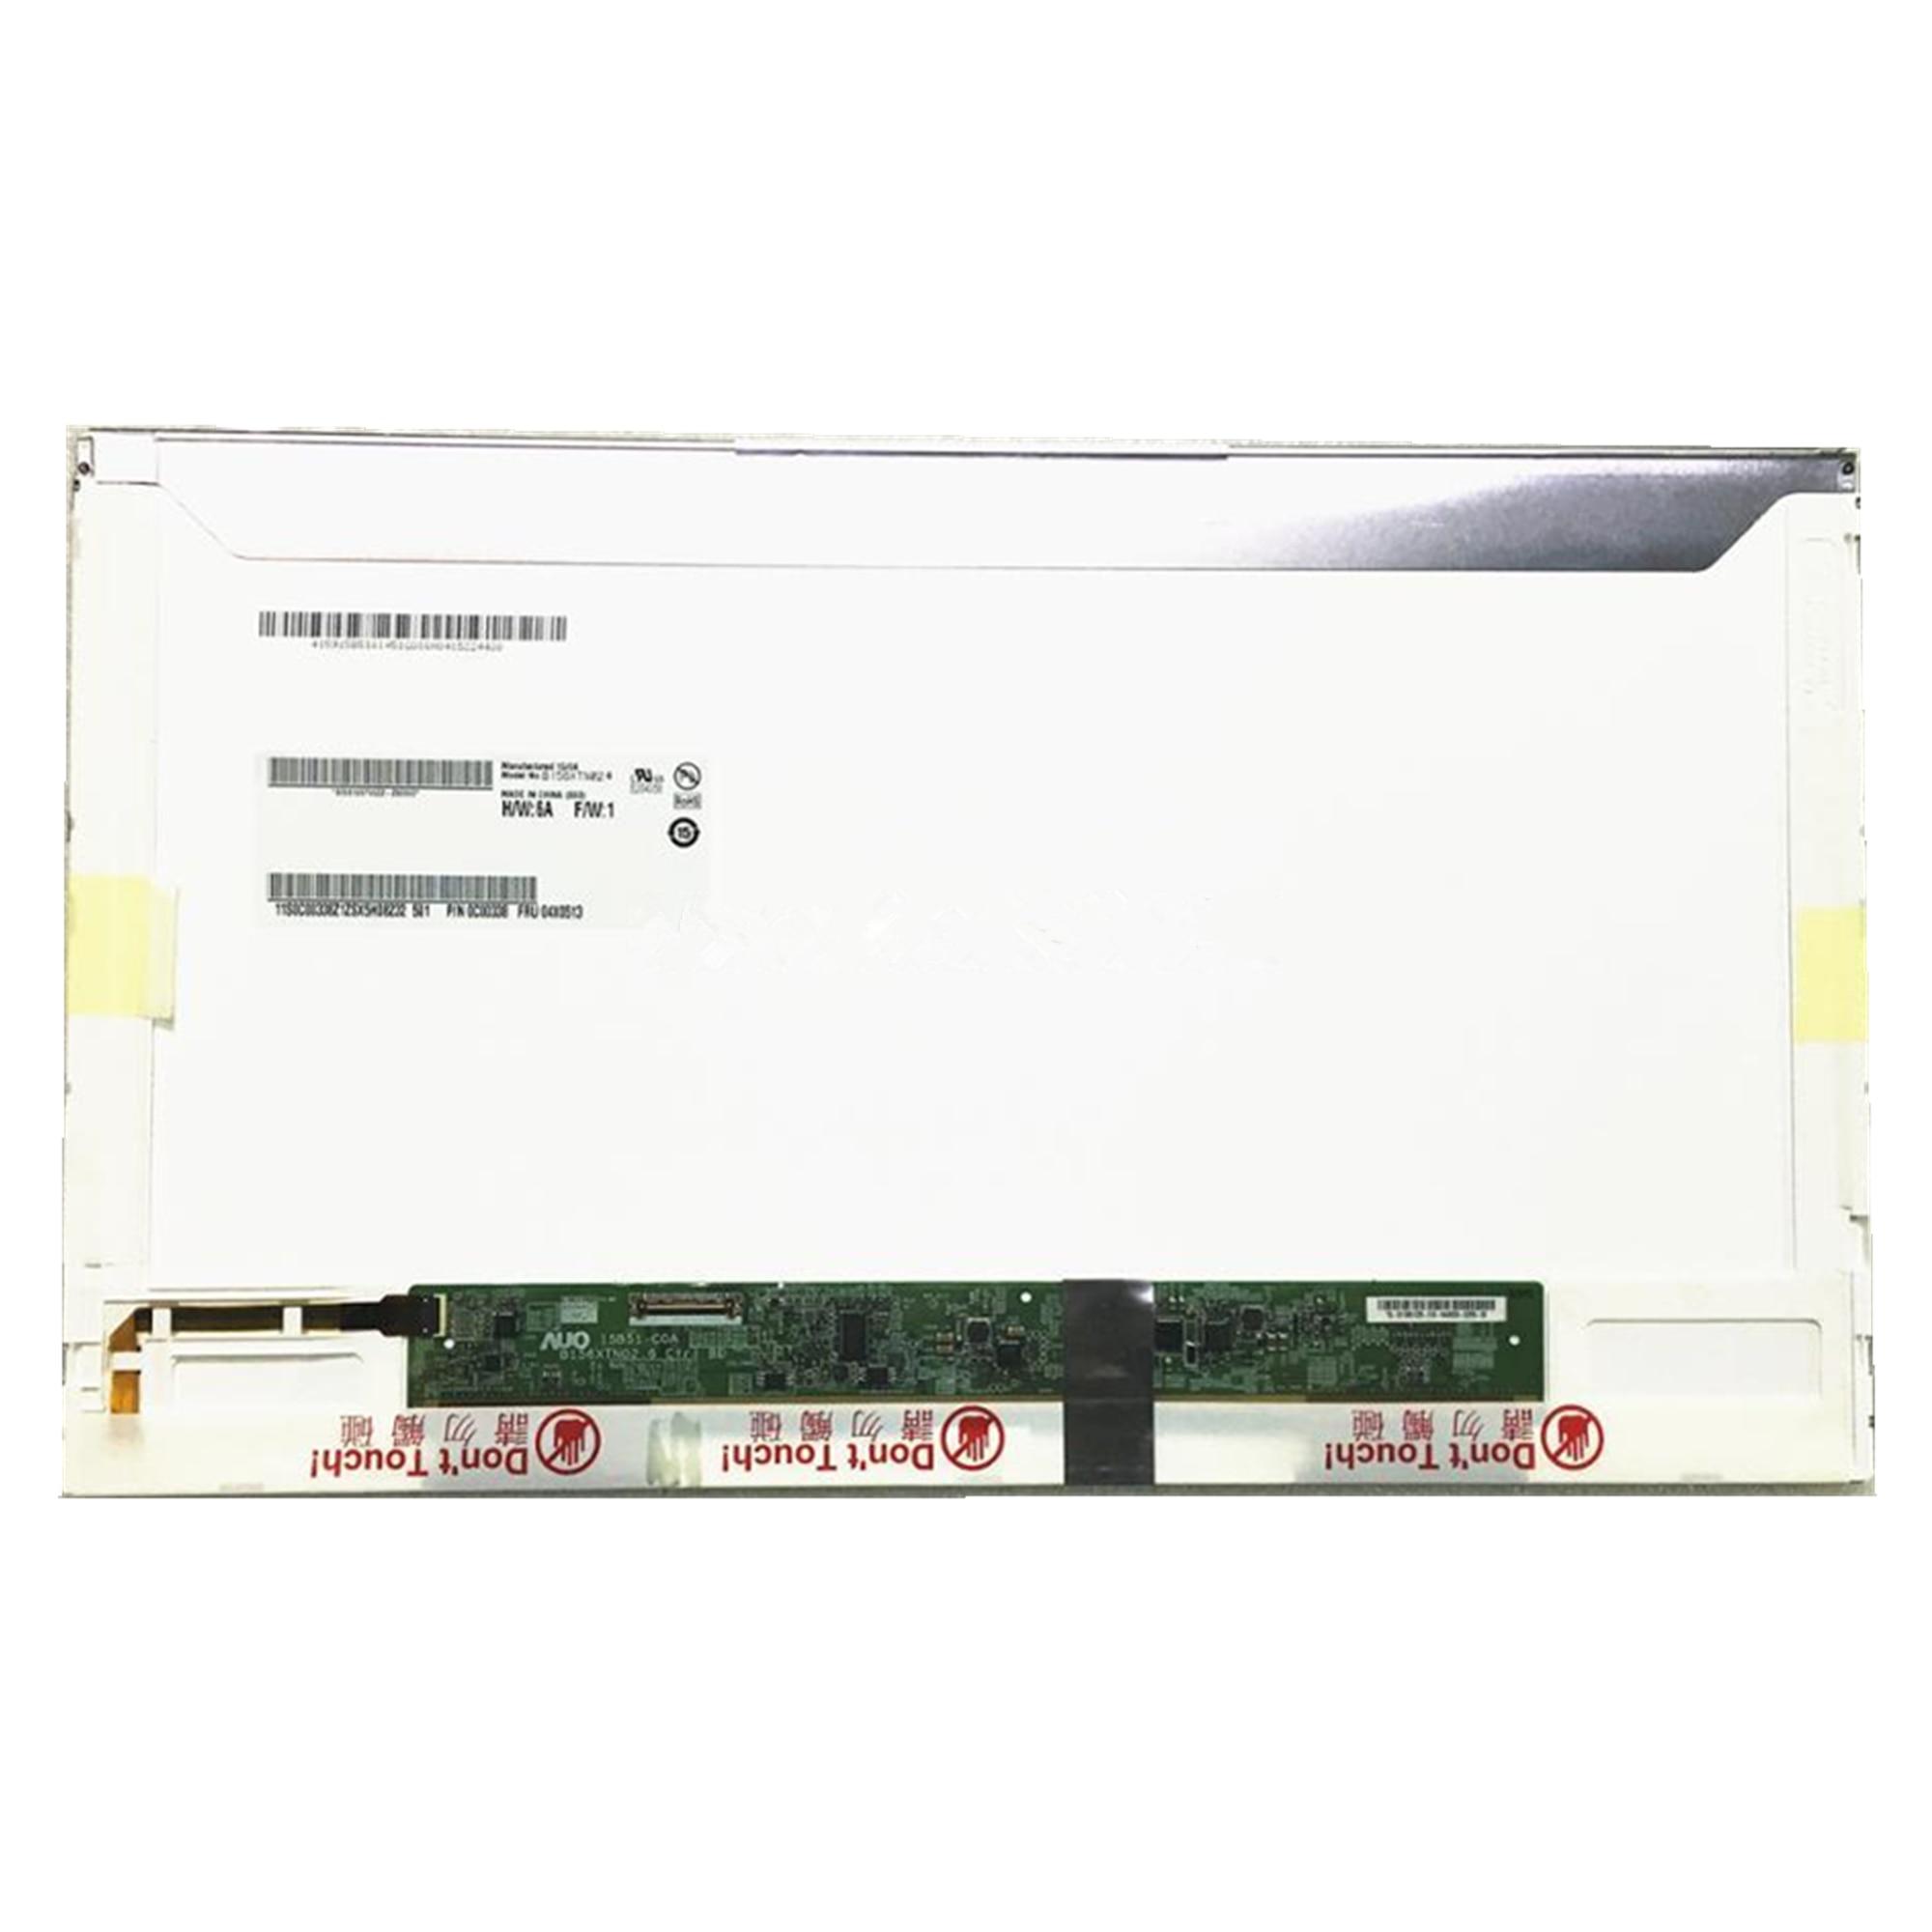 شحن مجاني B156XTN02.6 B156XTN01.0 CLAA156WA12 LP156WH4 TPA1 شاشة لاب توب LCD 1366*768 EDP 30 دبابيس